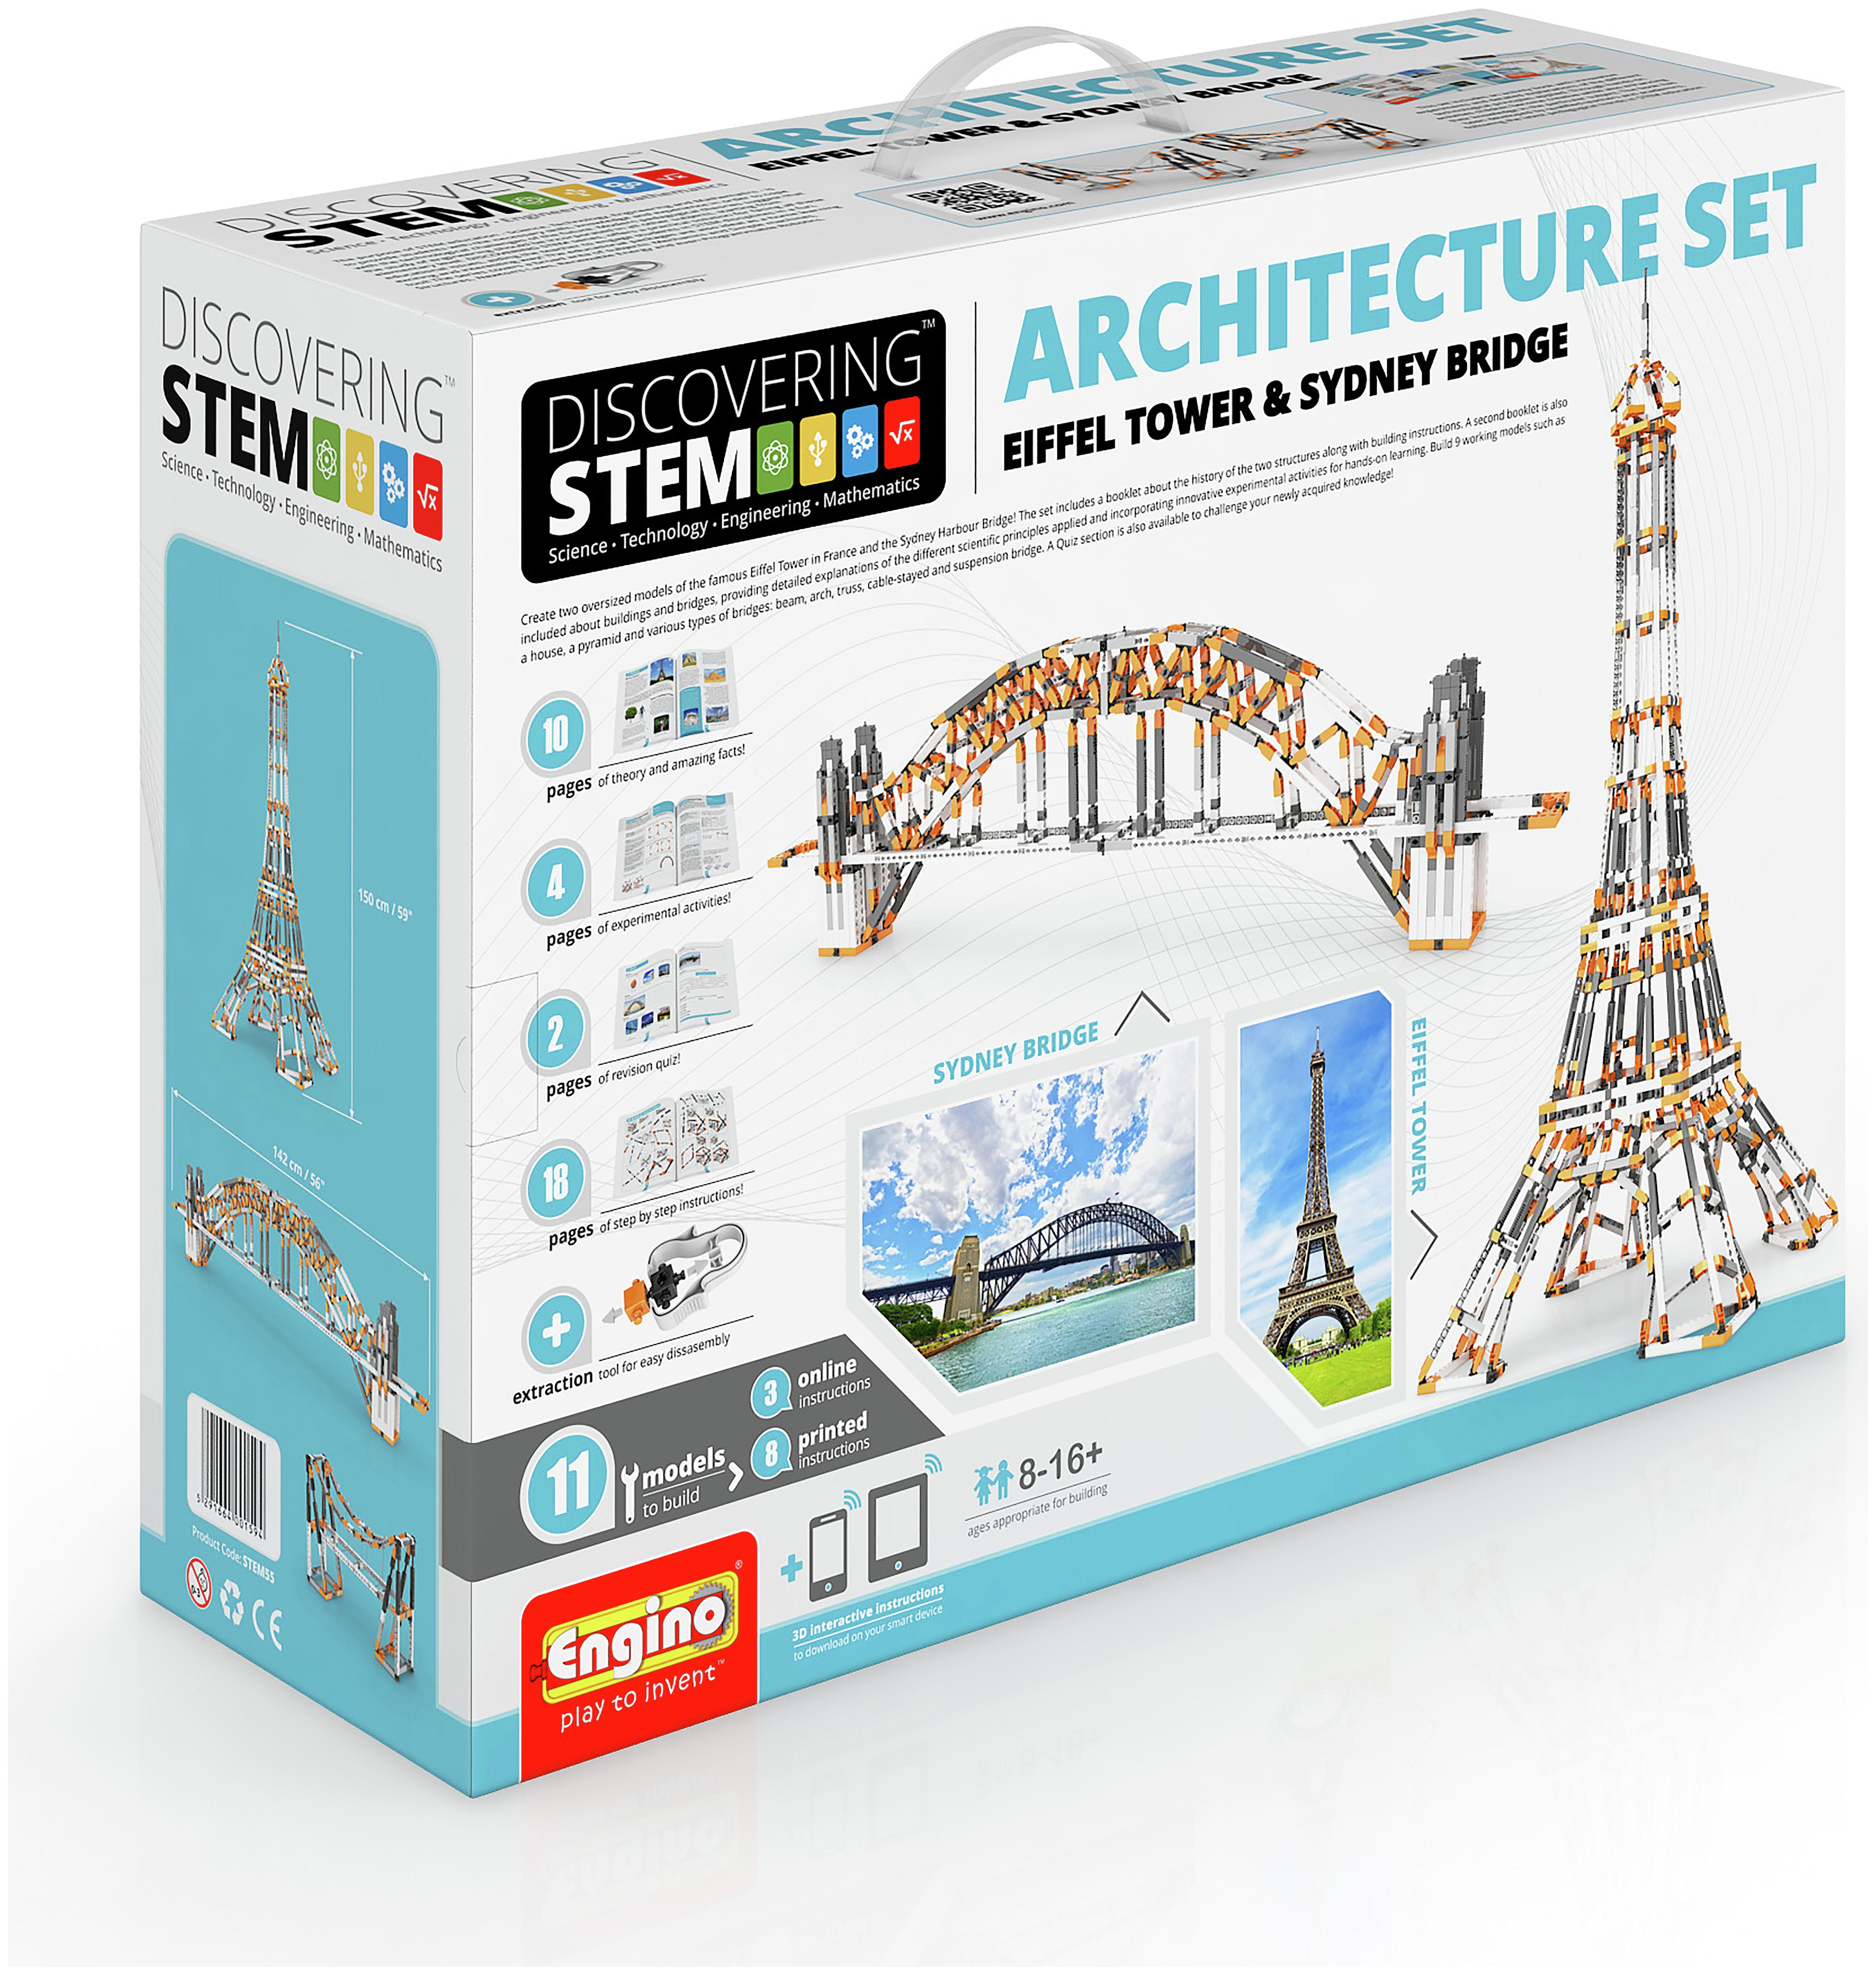 Image of Engino STEM Architecture Set - Eiffel Tower & Sydney Bridge.